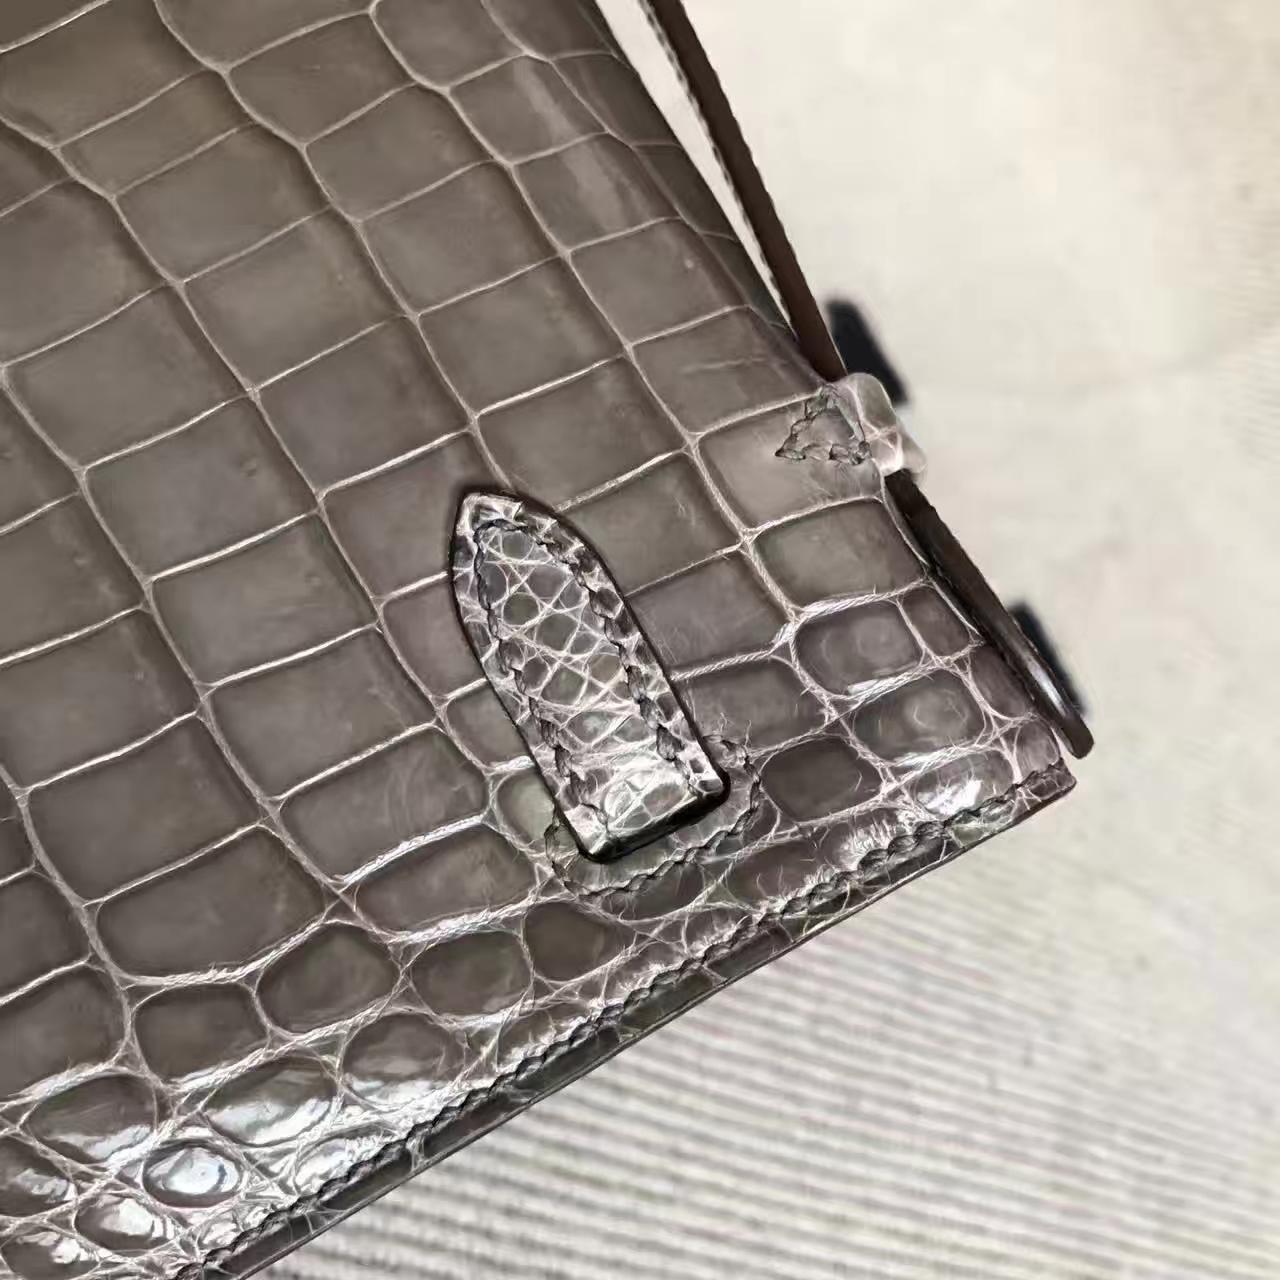 New Arrival Hermes C18 Etoupe Grey Crocodile Shiny Leather Minikelly Bag 22cm